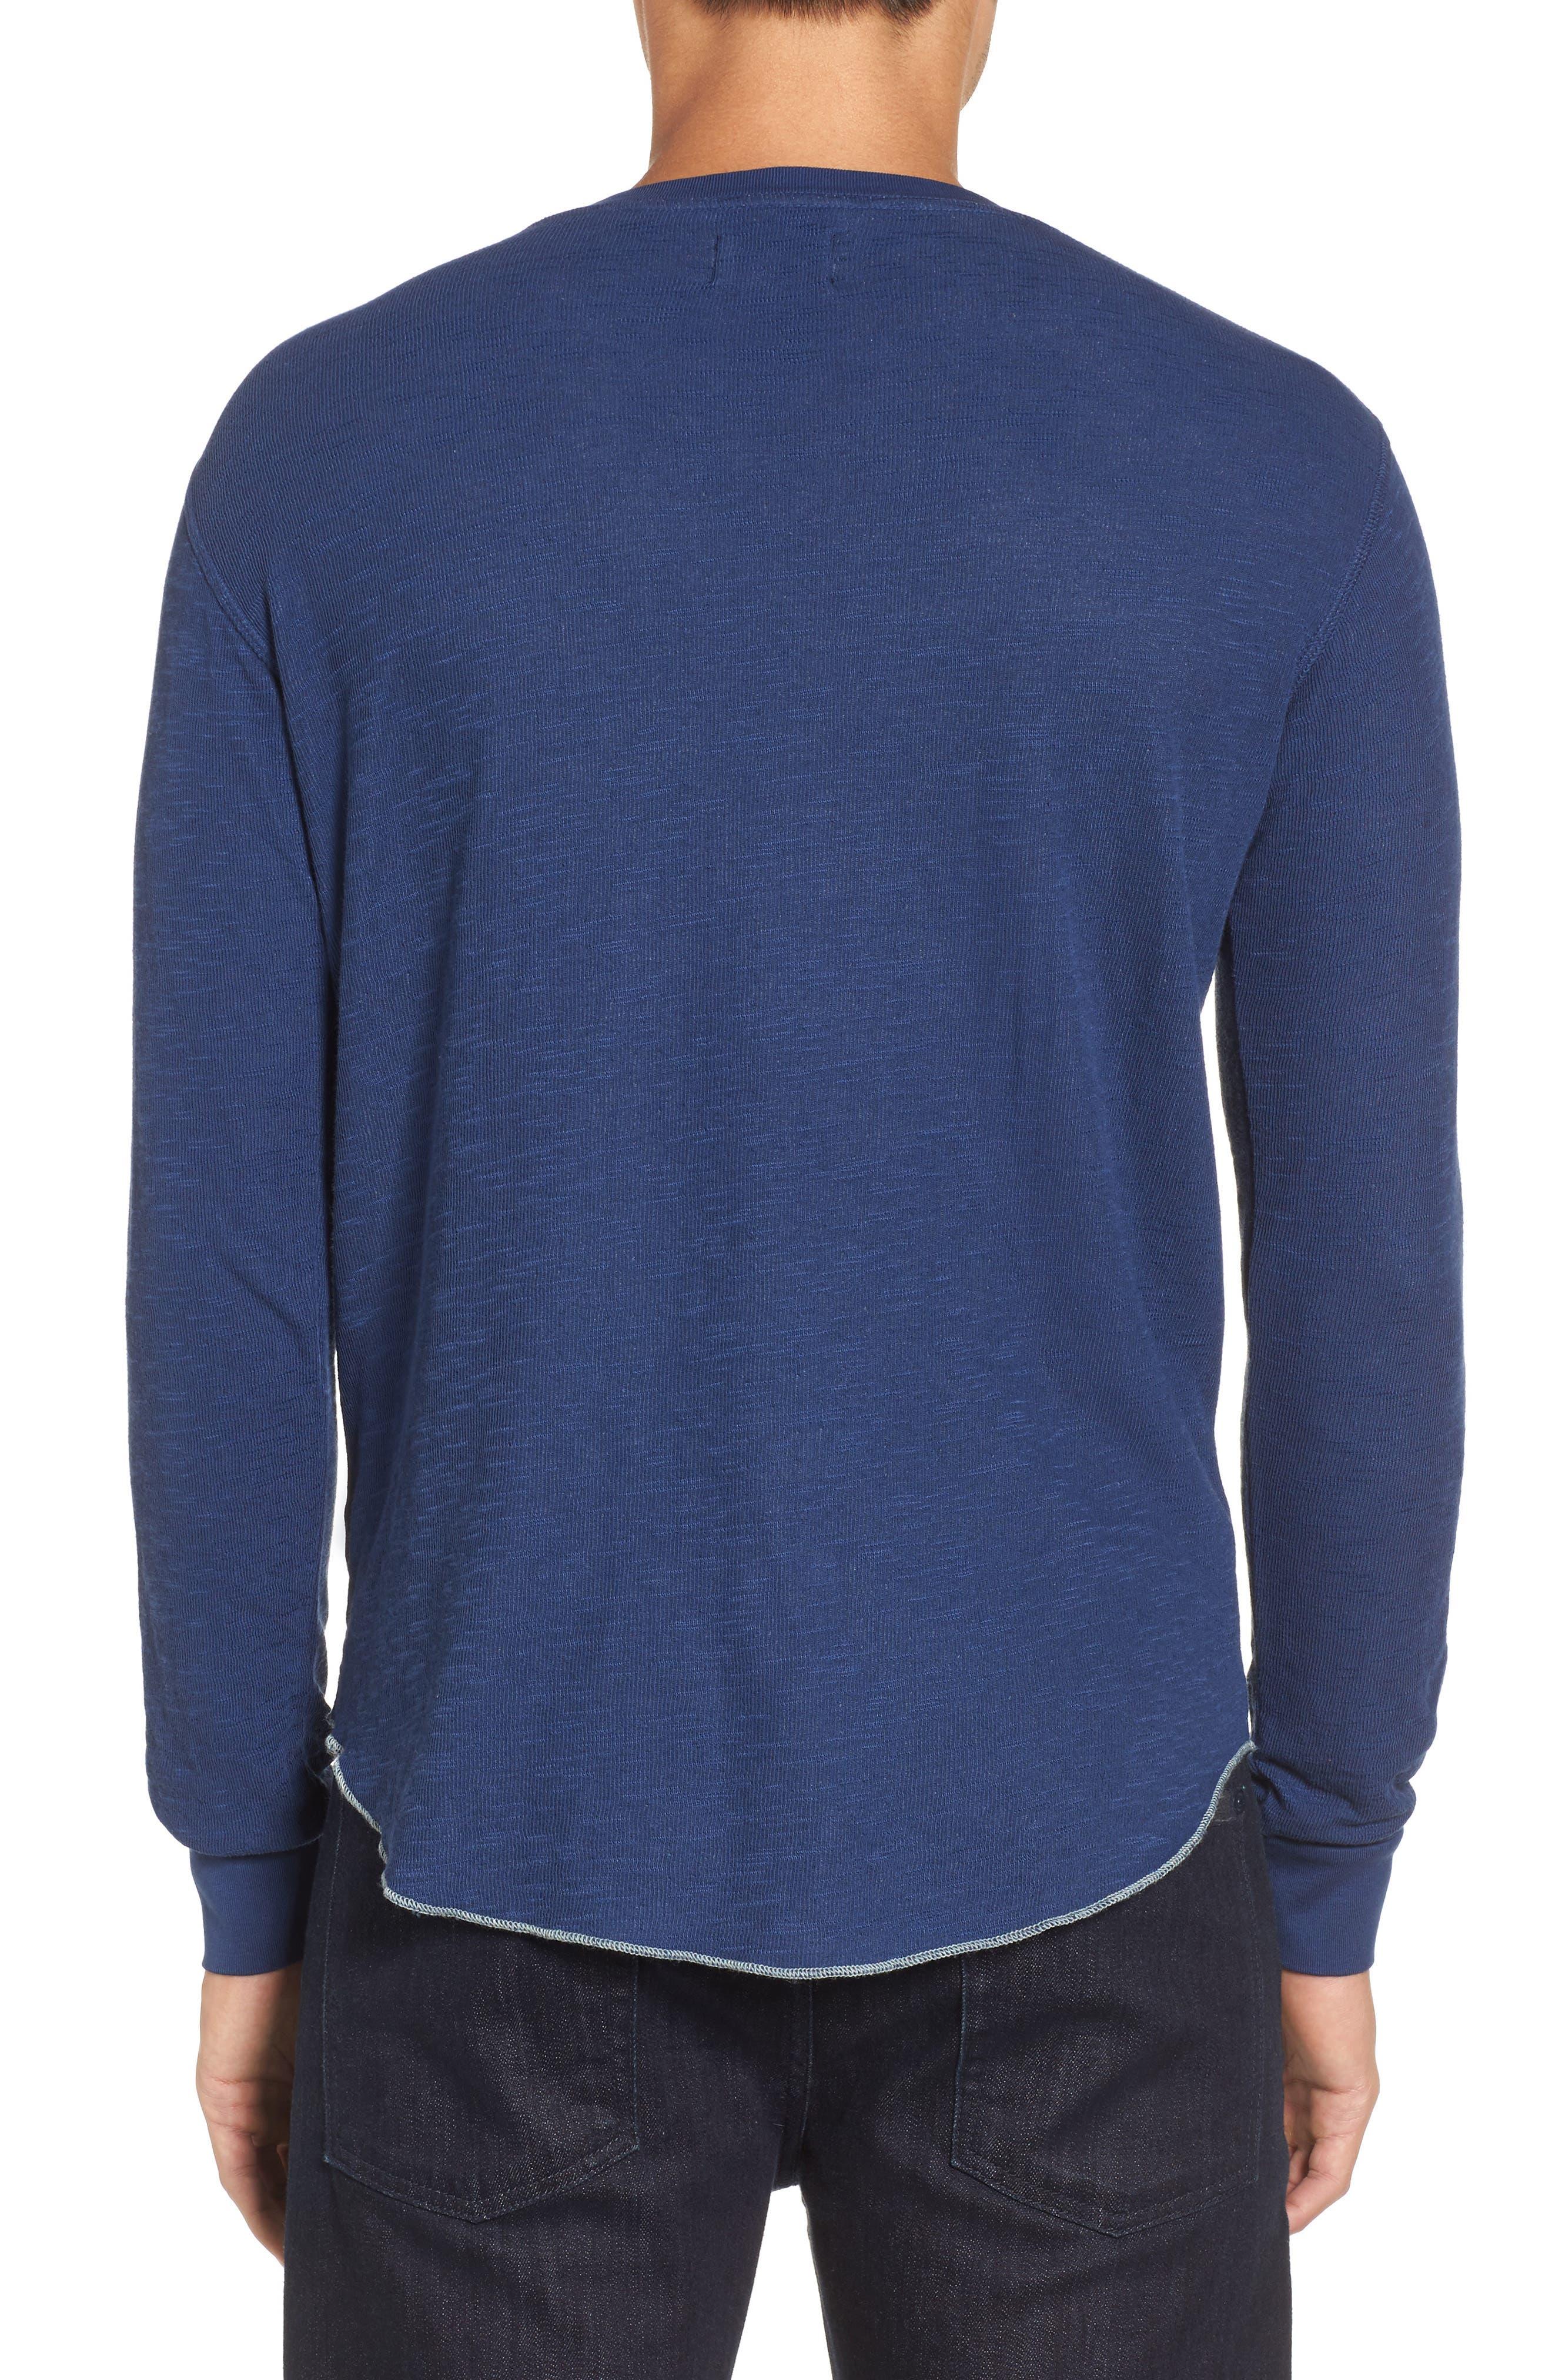 Alternate Image 2  - Goodlife Double Layer Slim Crewneck T-Shirt